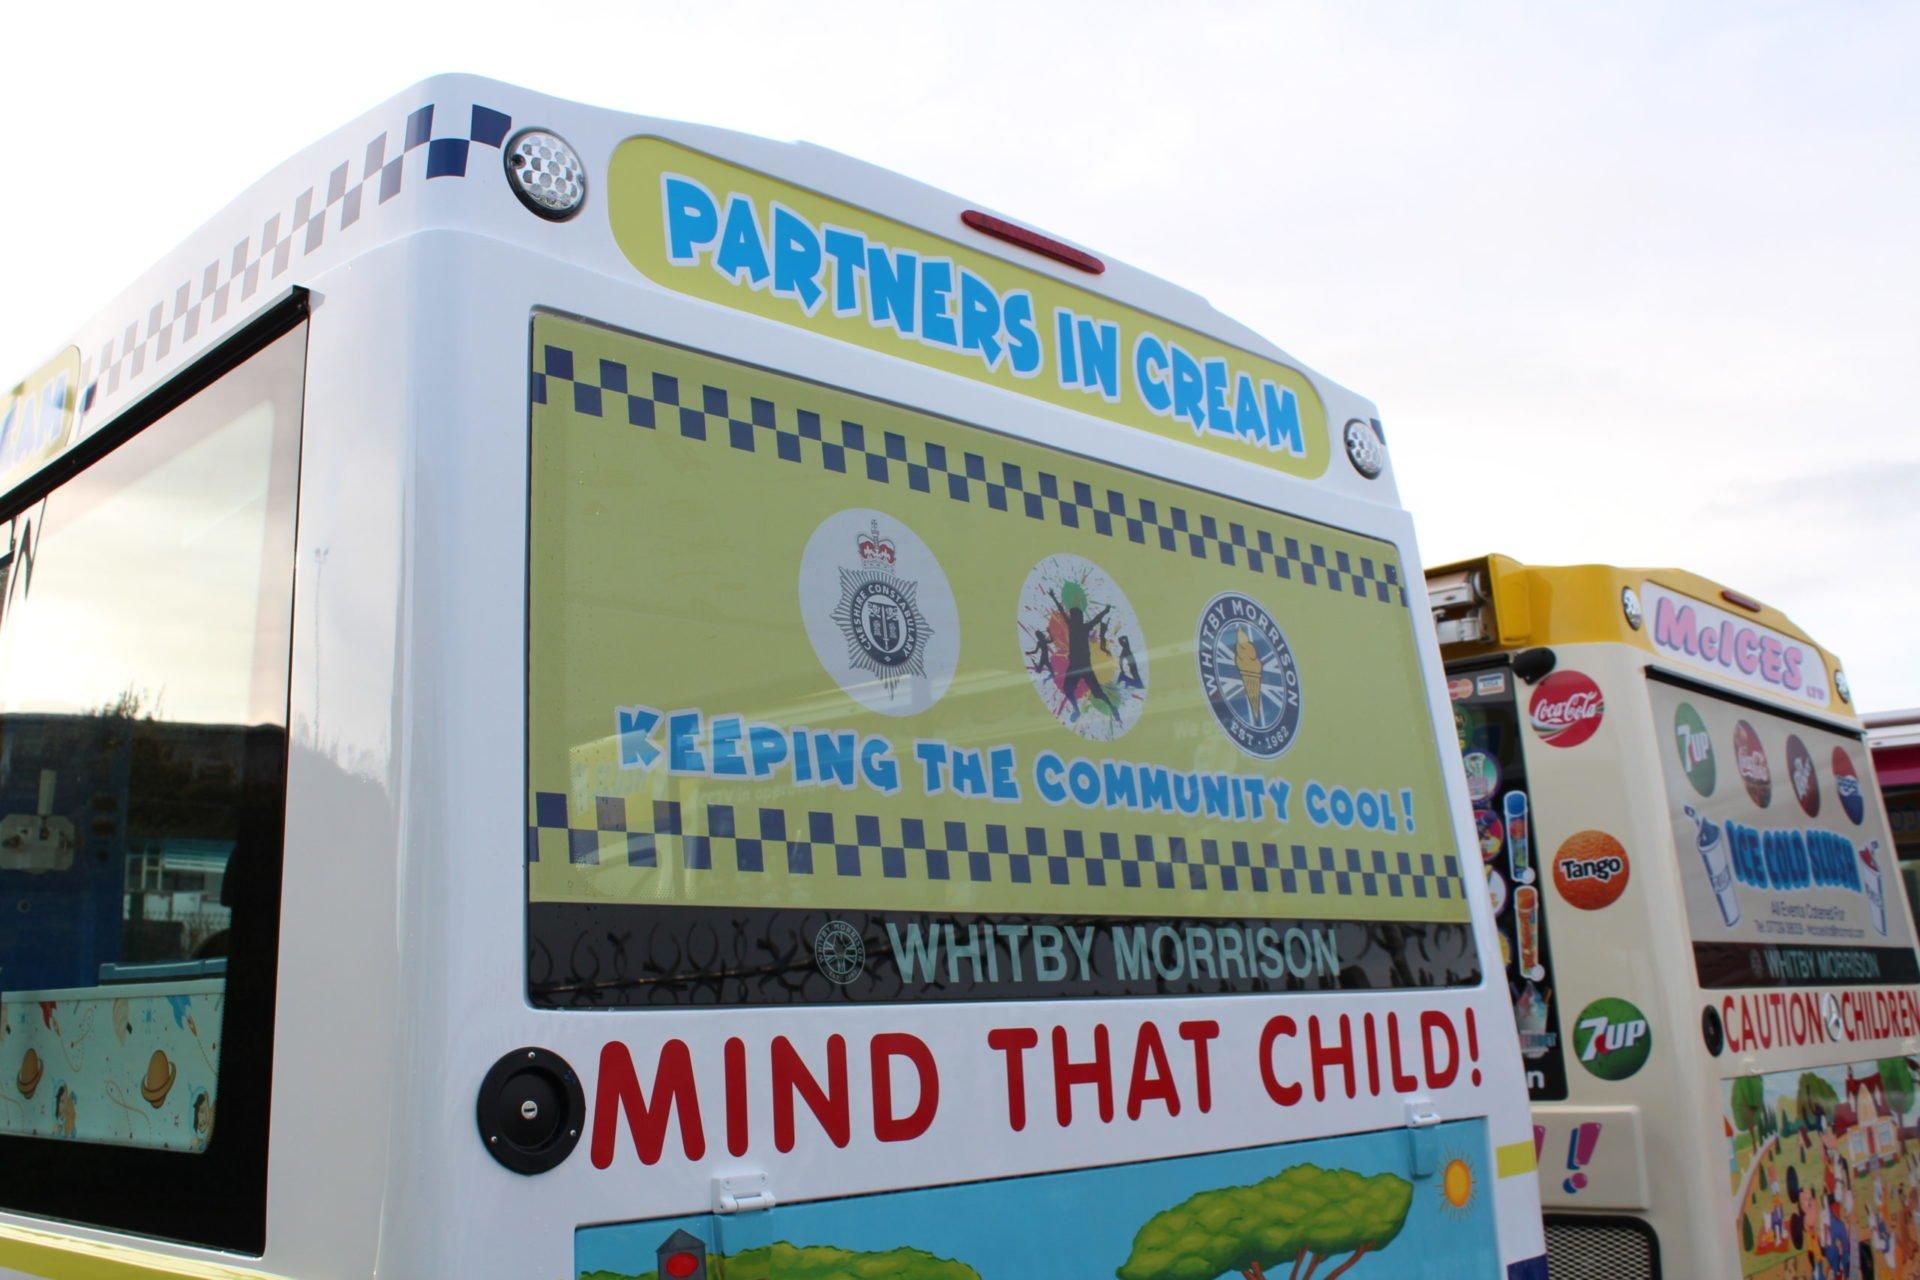 whitby-morrison-ice-cream-van-perforated-window-film